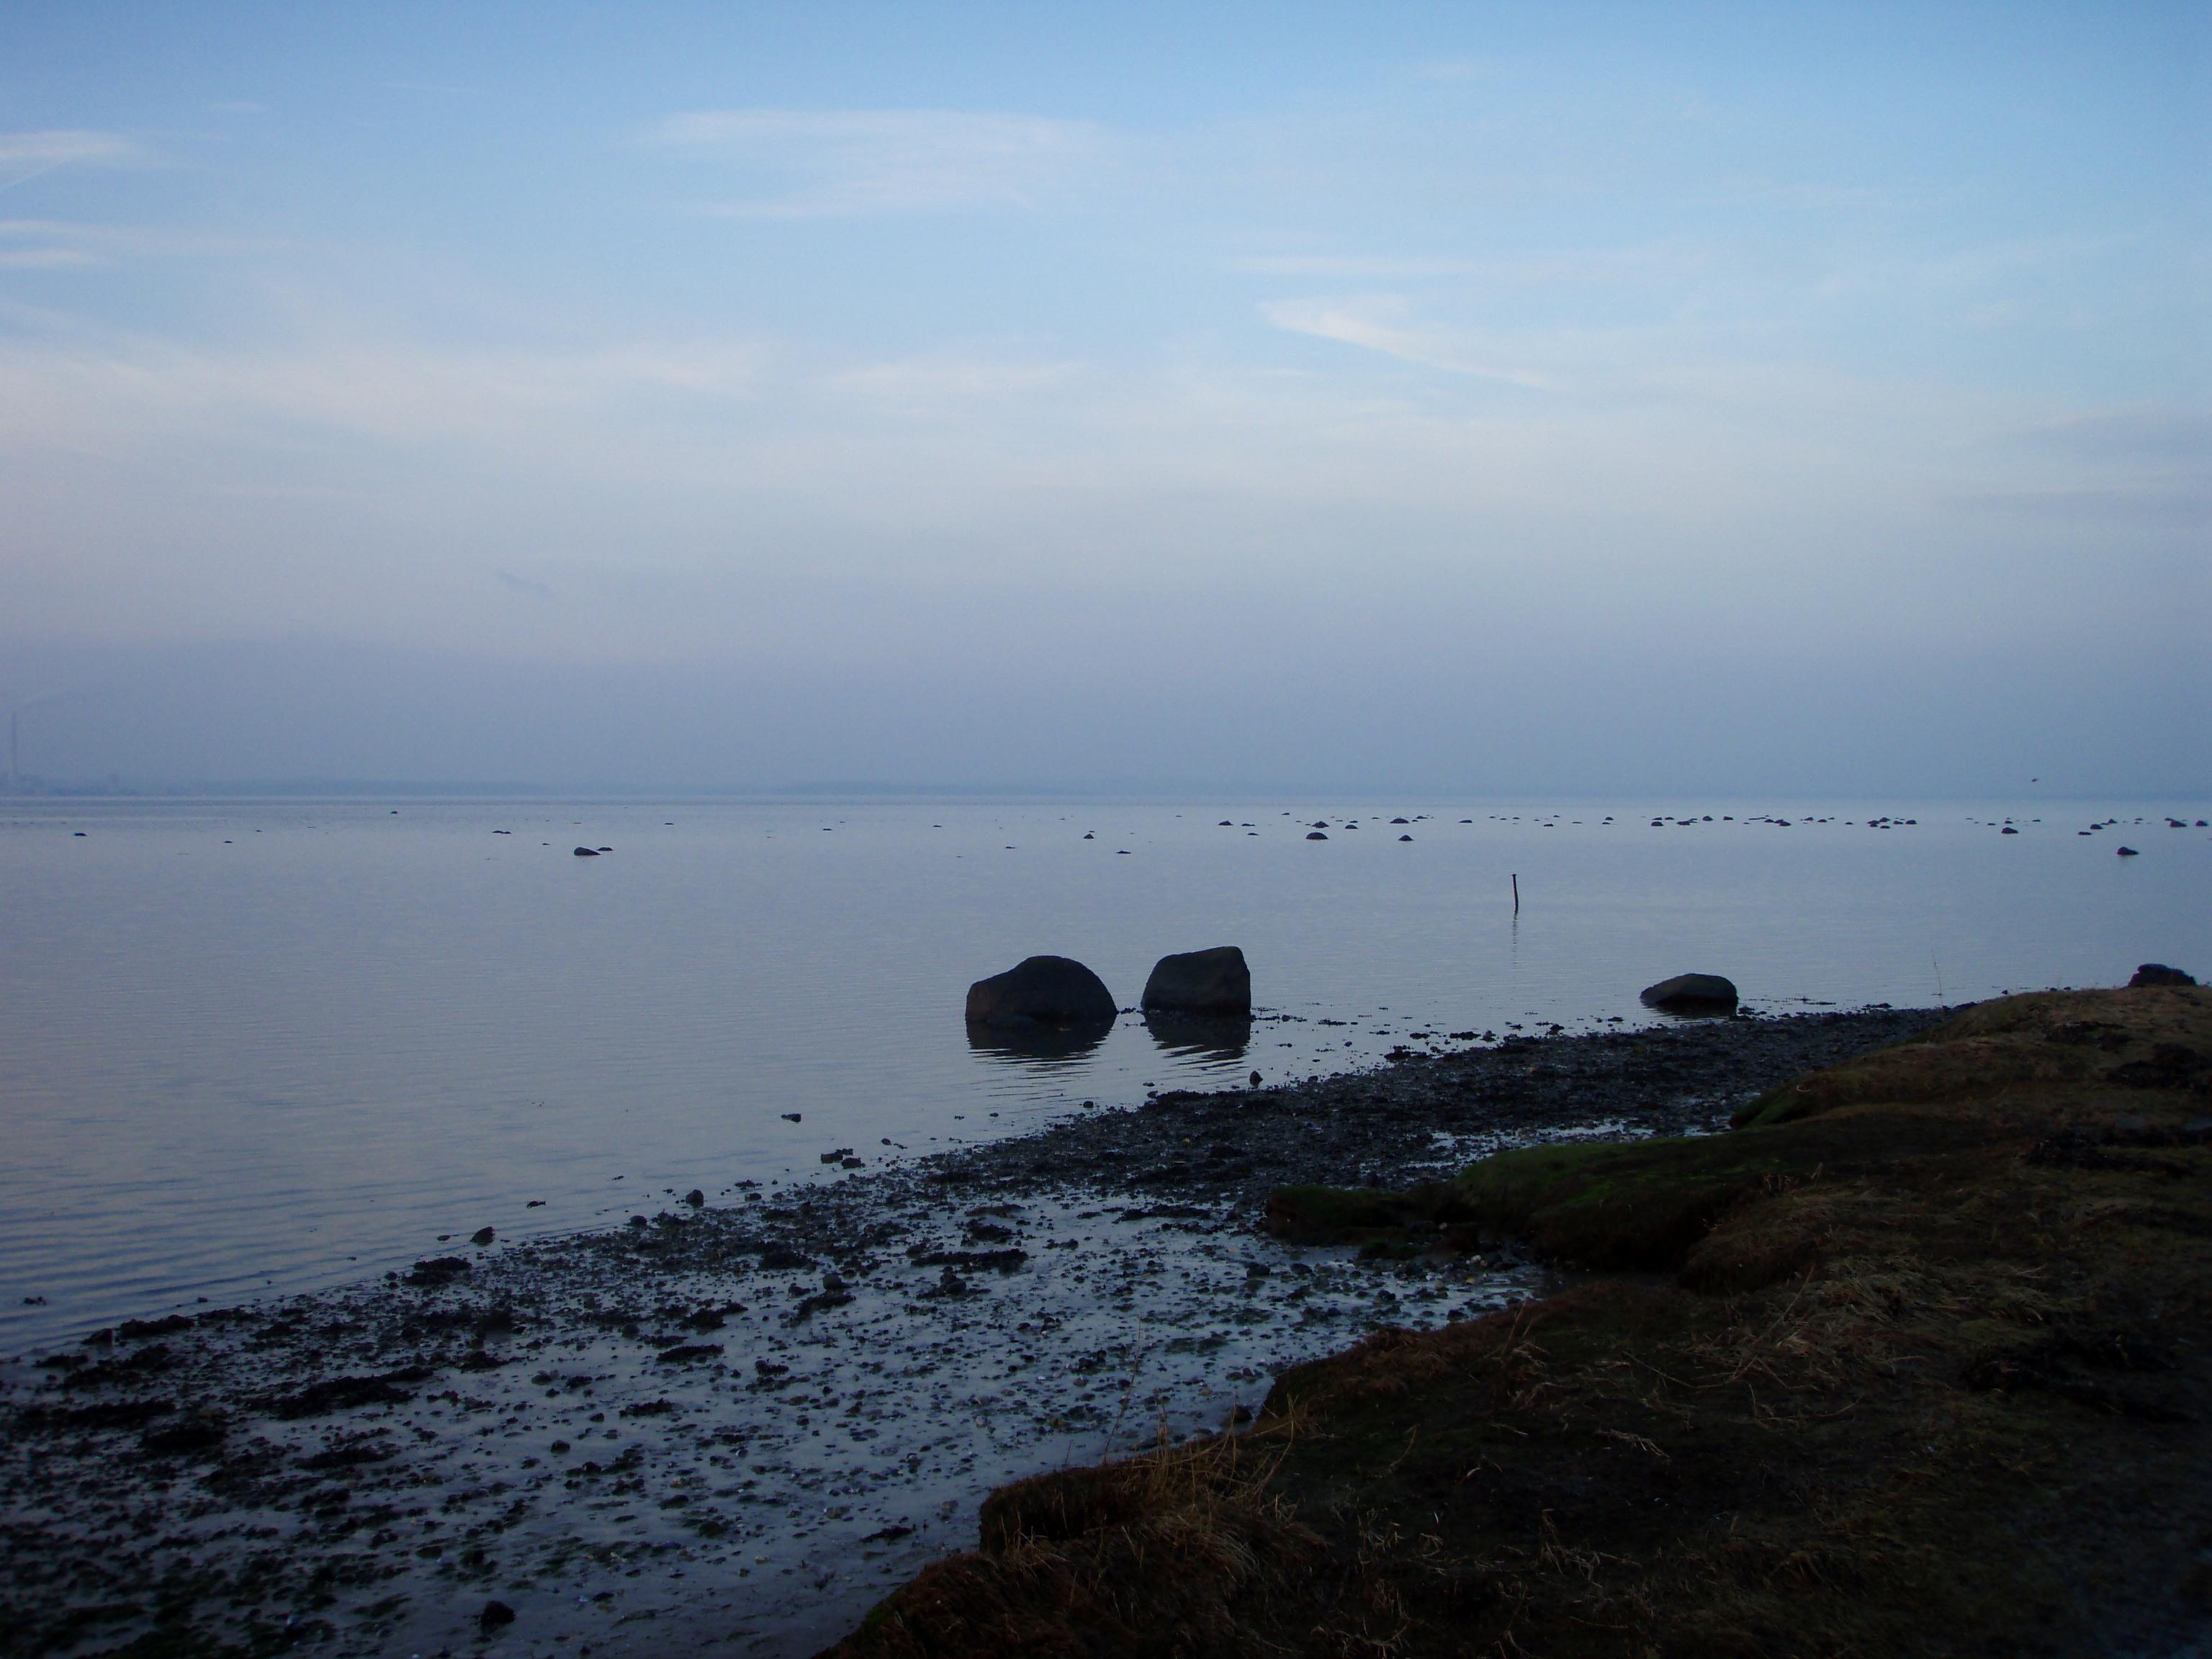 strand Skødshoved Strand